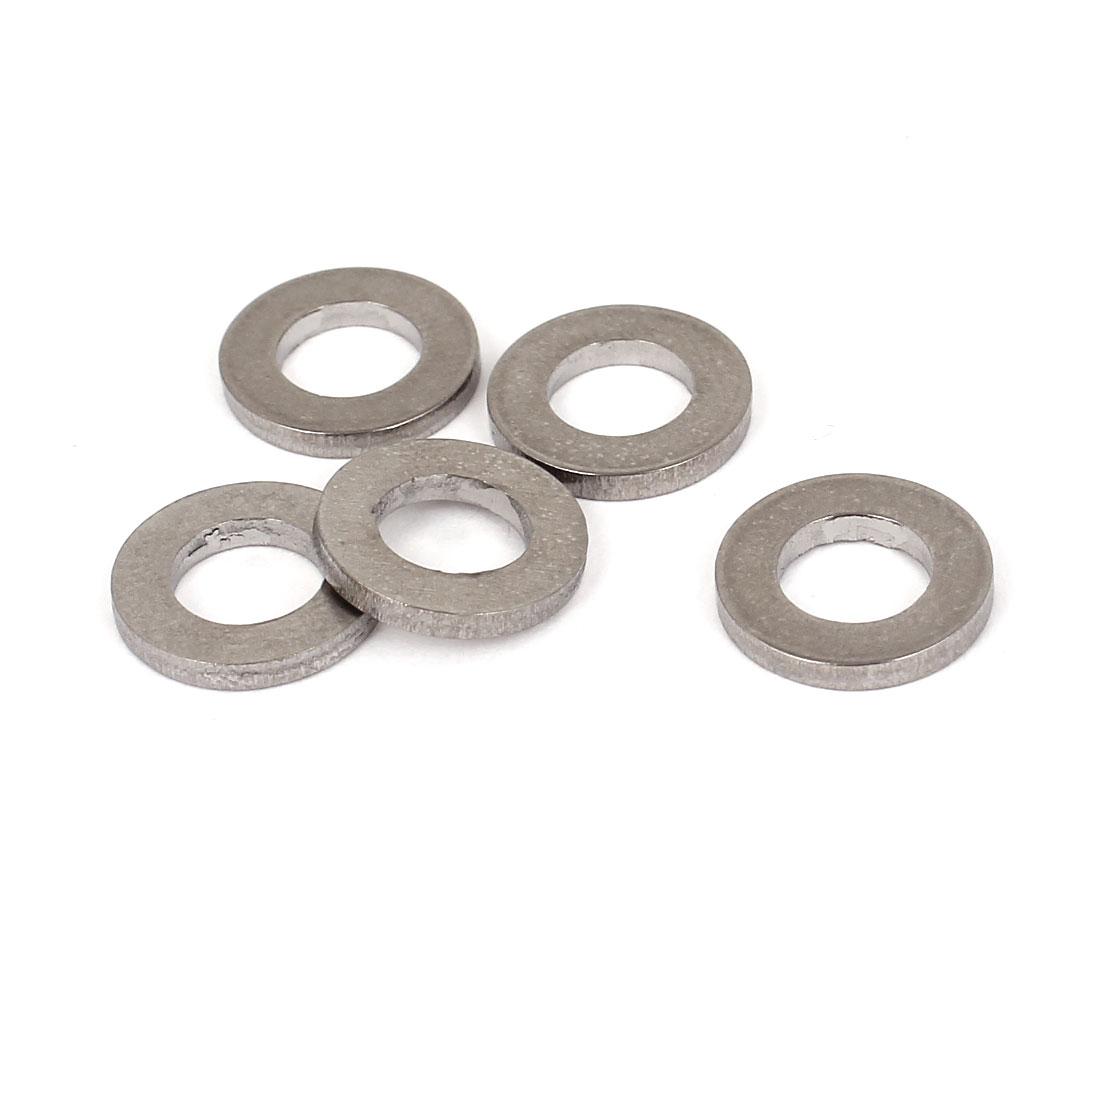 5pcs M6 Silver Tone Titanium Ti Metric Plain Flat Washer DIN 125A for Bolt Screw